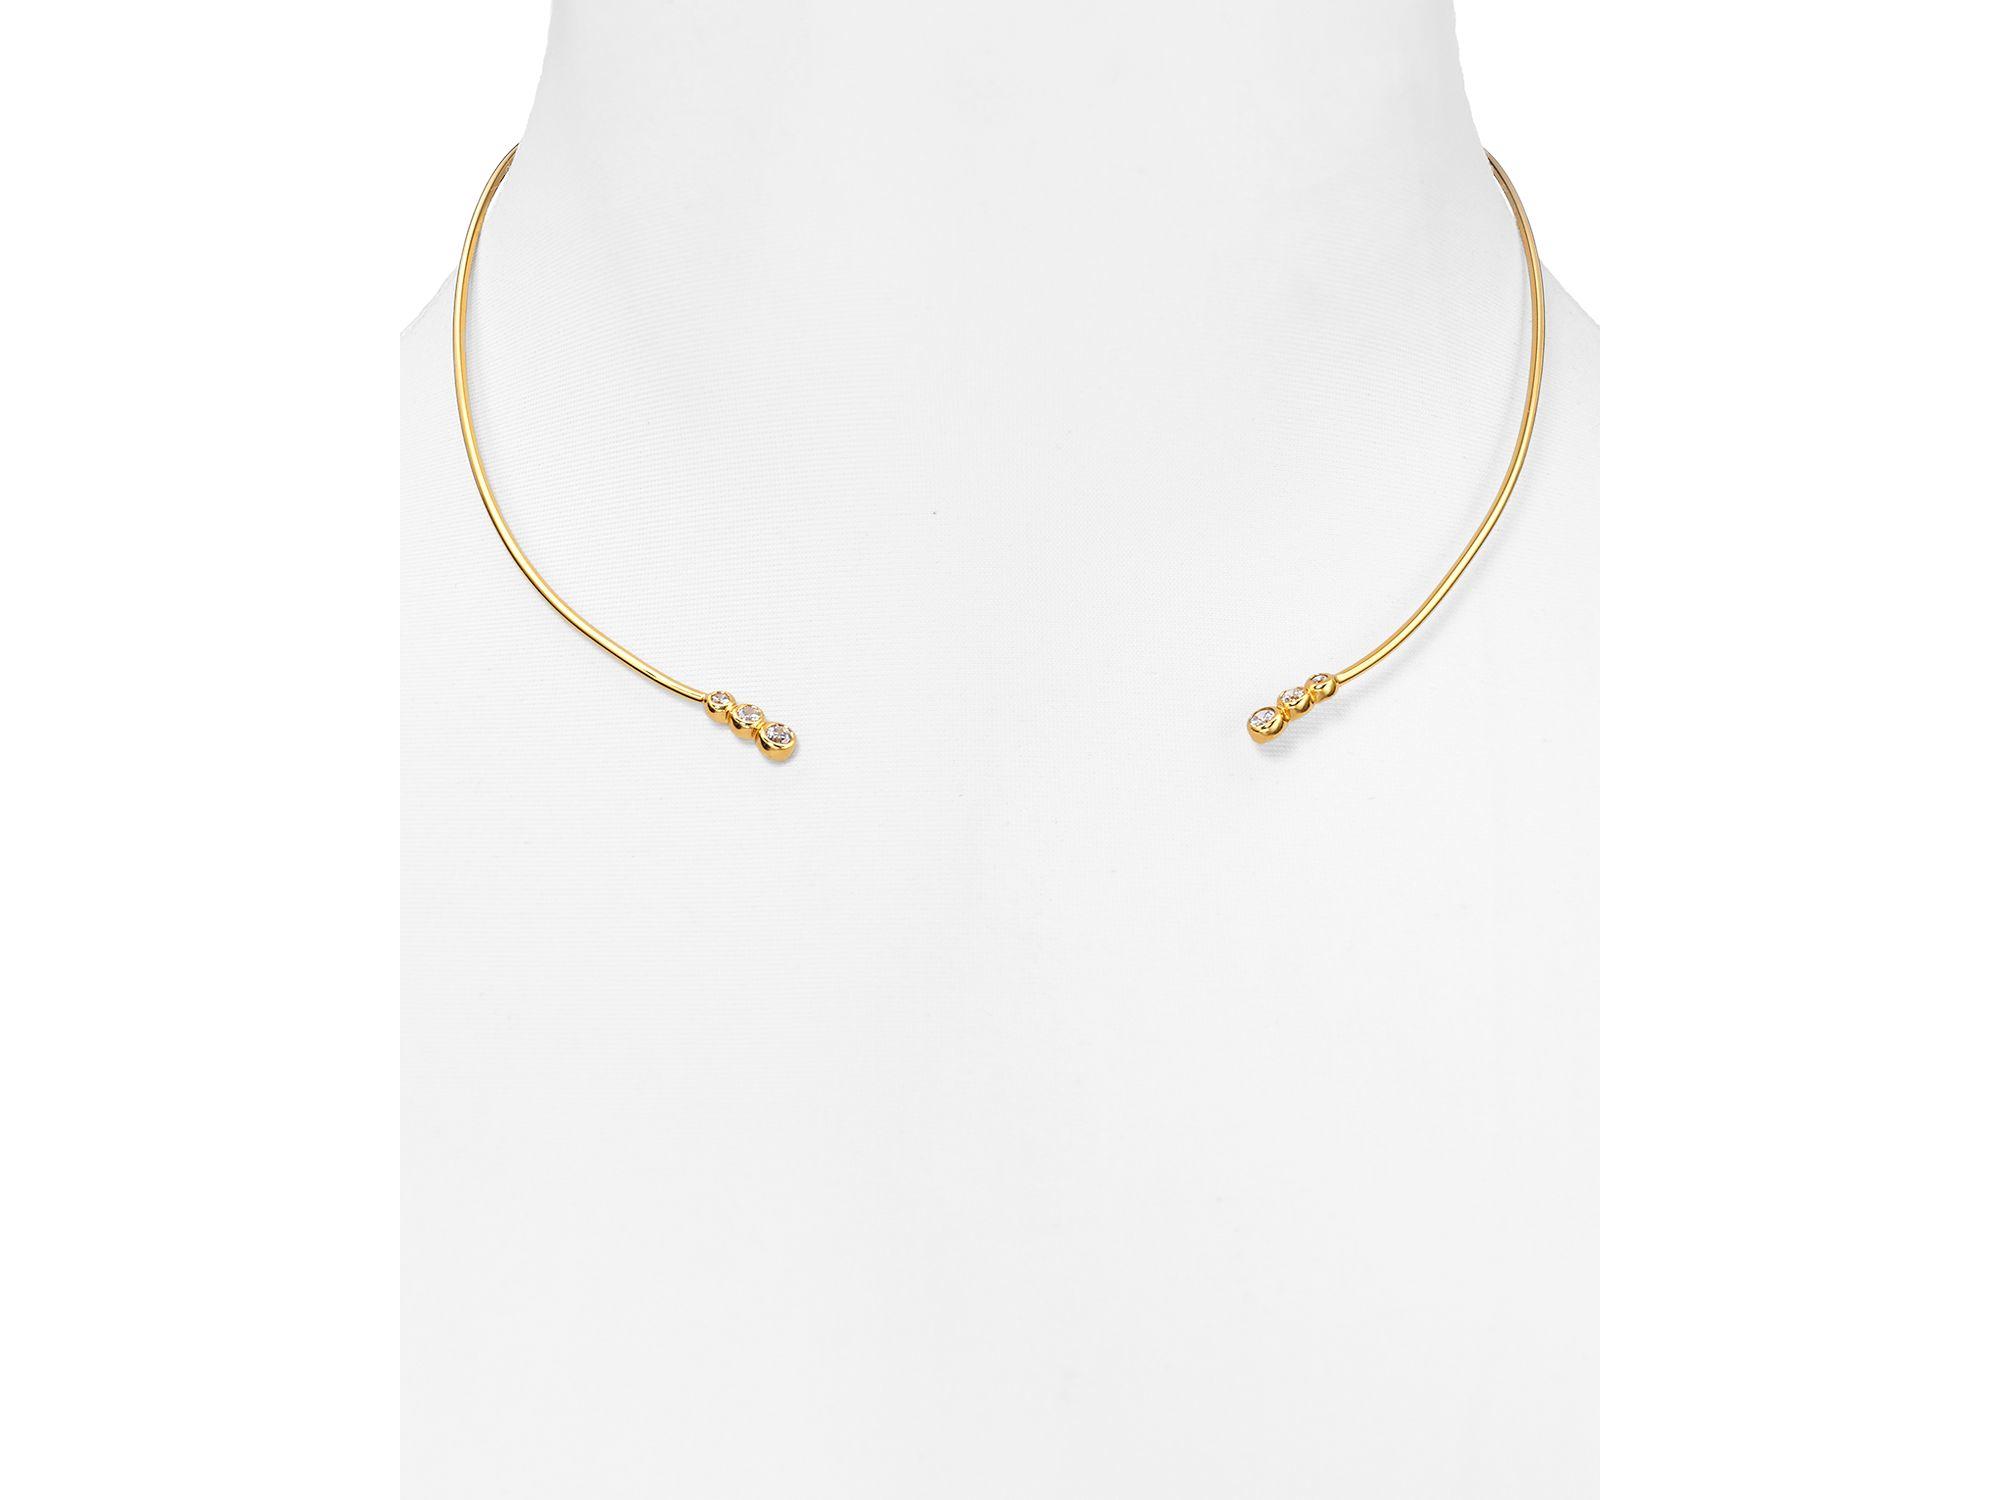 Lyst - Argento Vivo Memory Wire Triple Stone Collar Necklace in Metallic